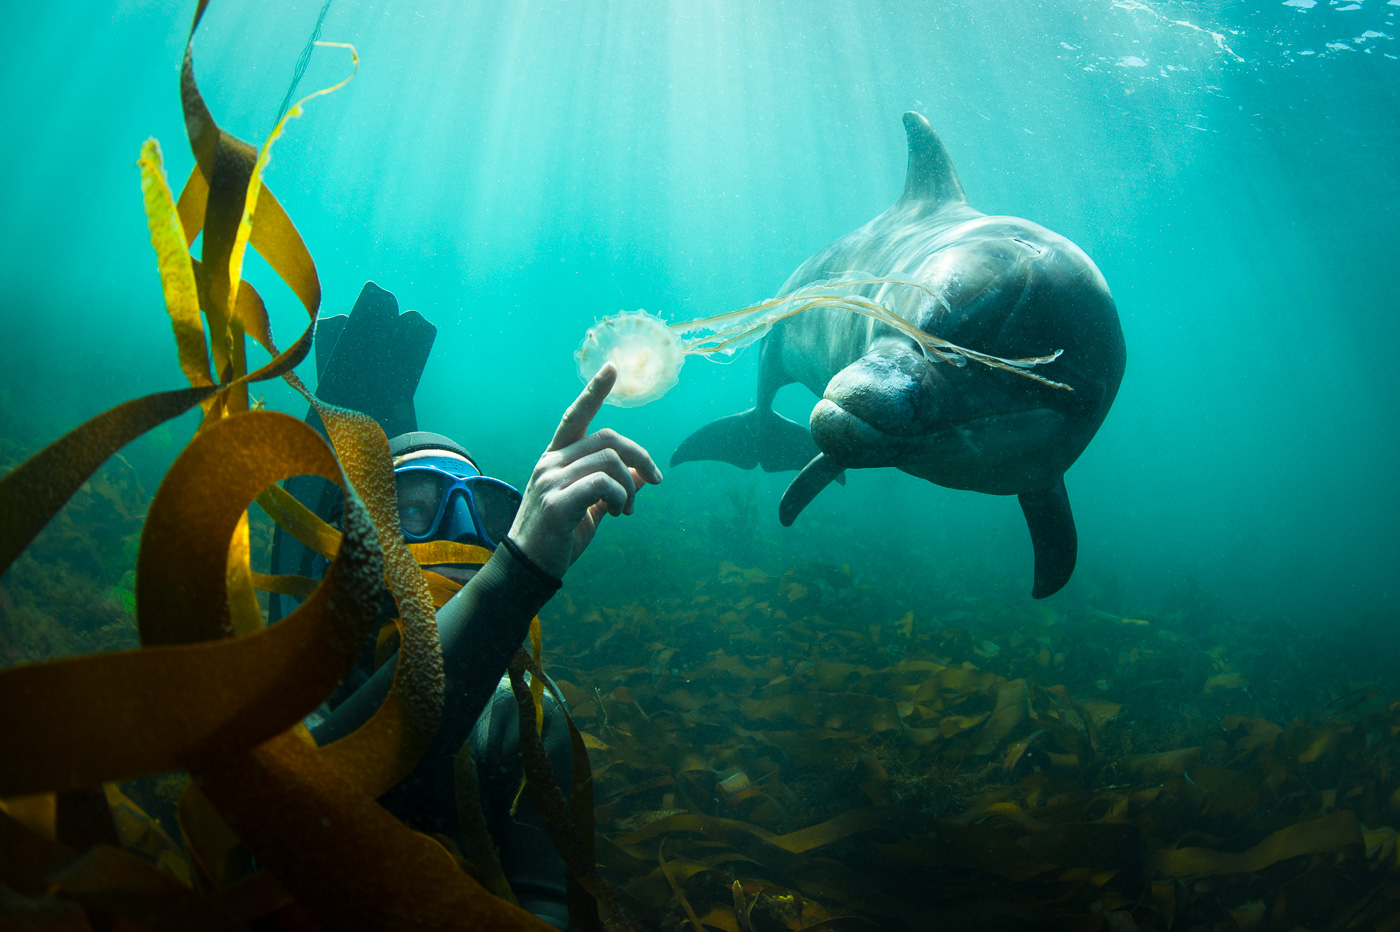 underwater magic moment